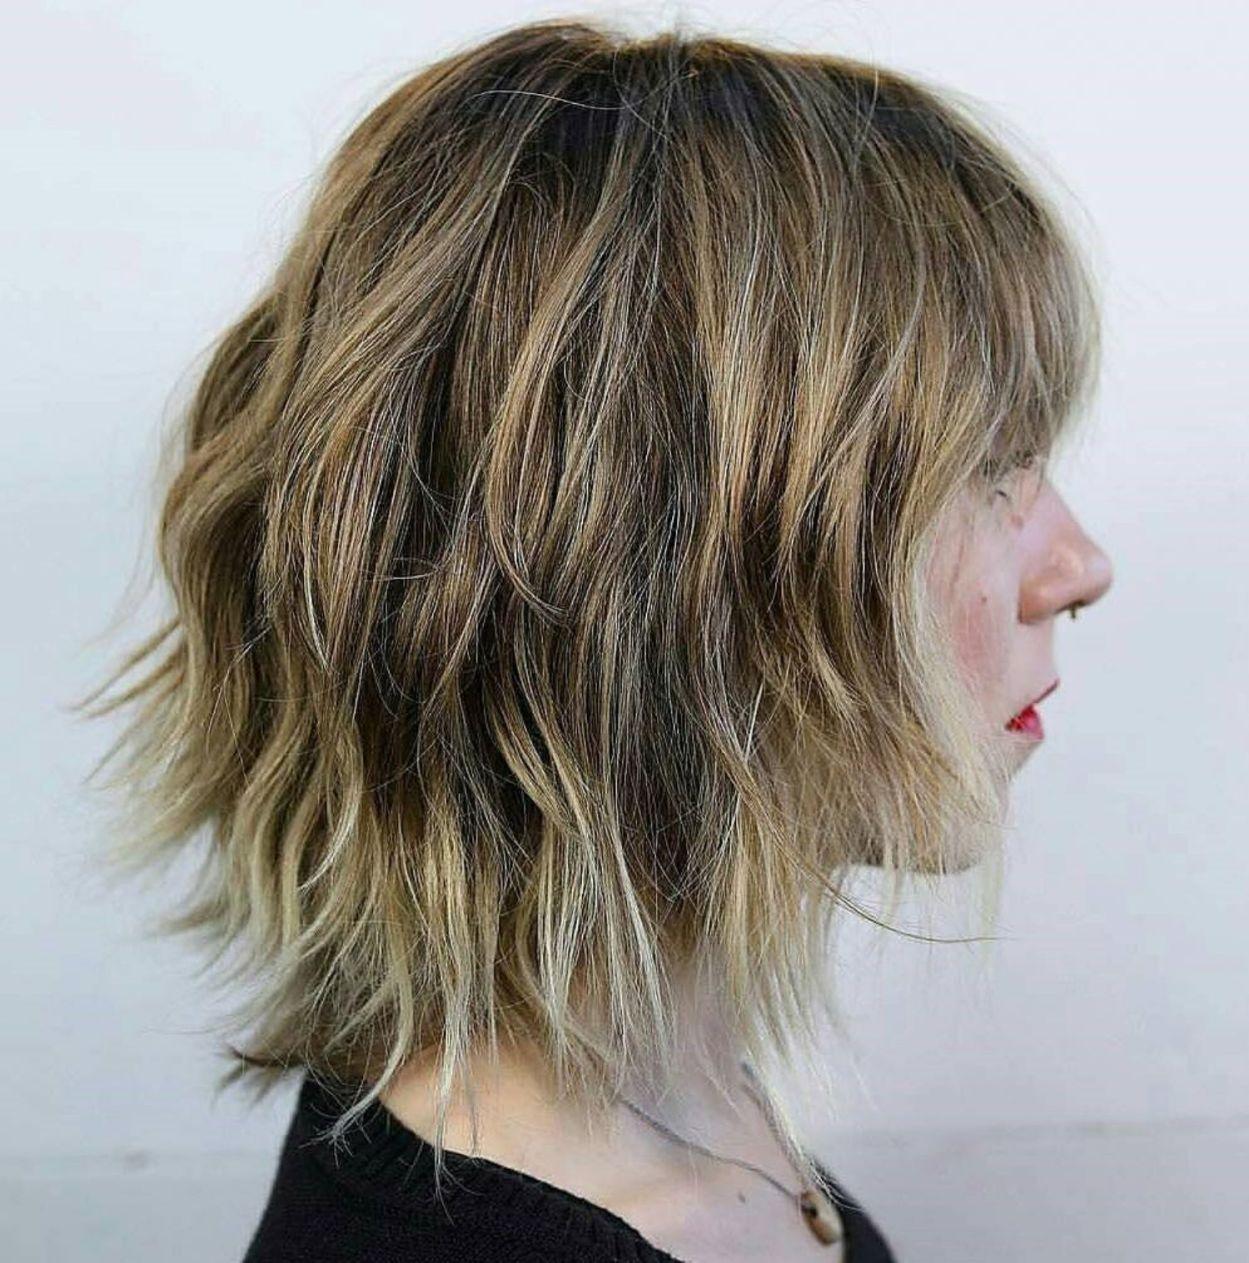 13+ 60 messy bob hairstyles info